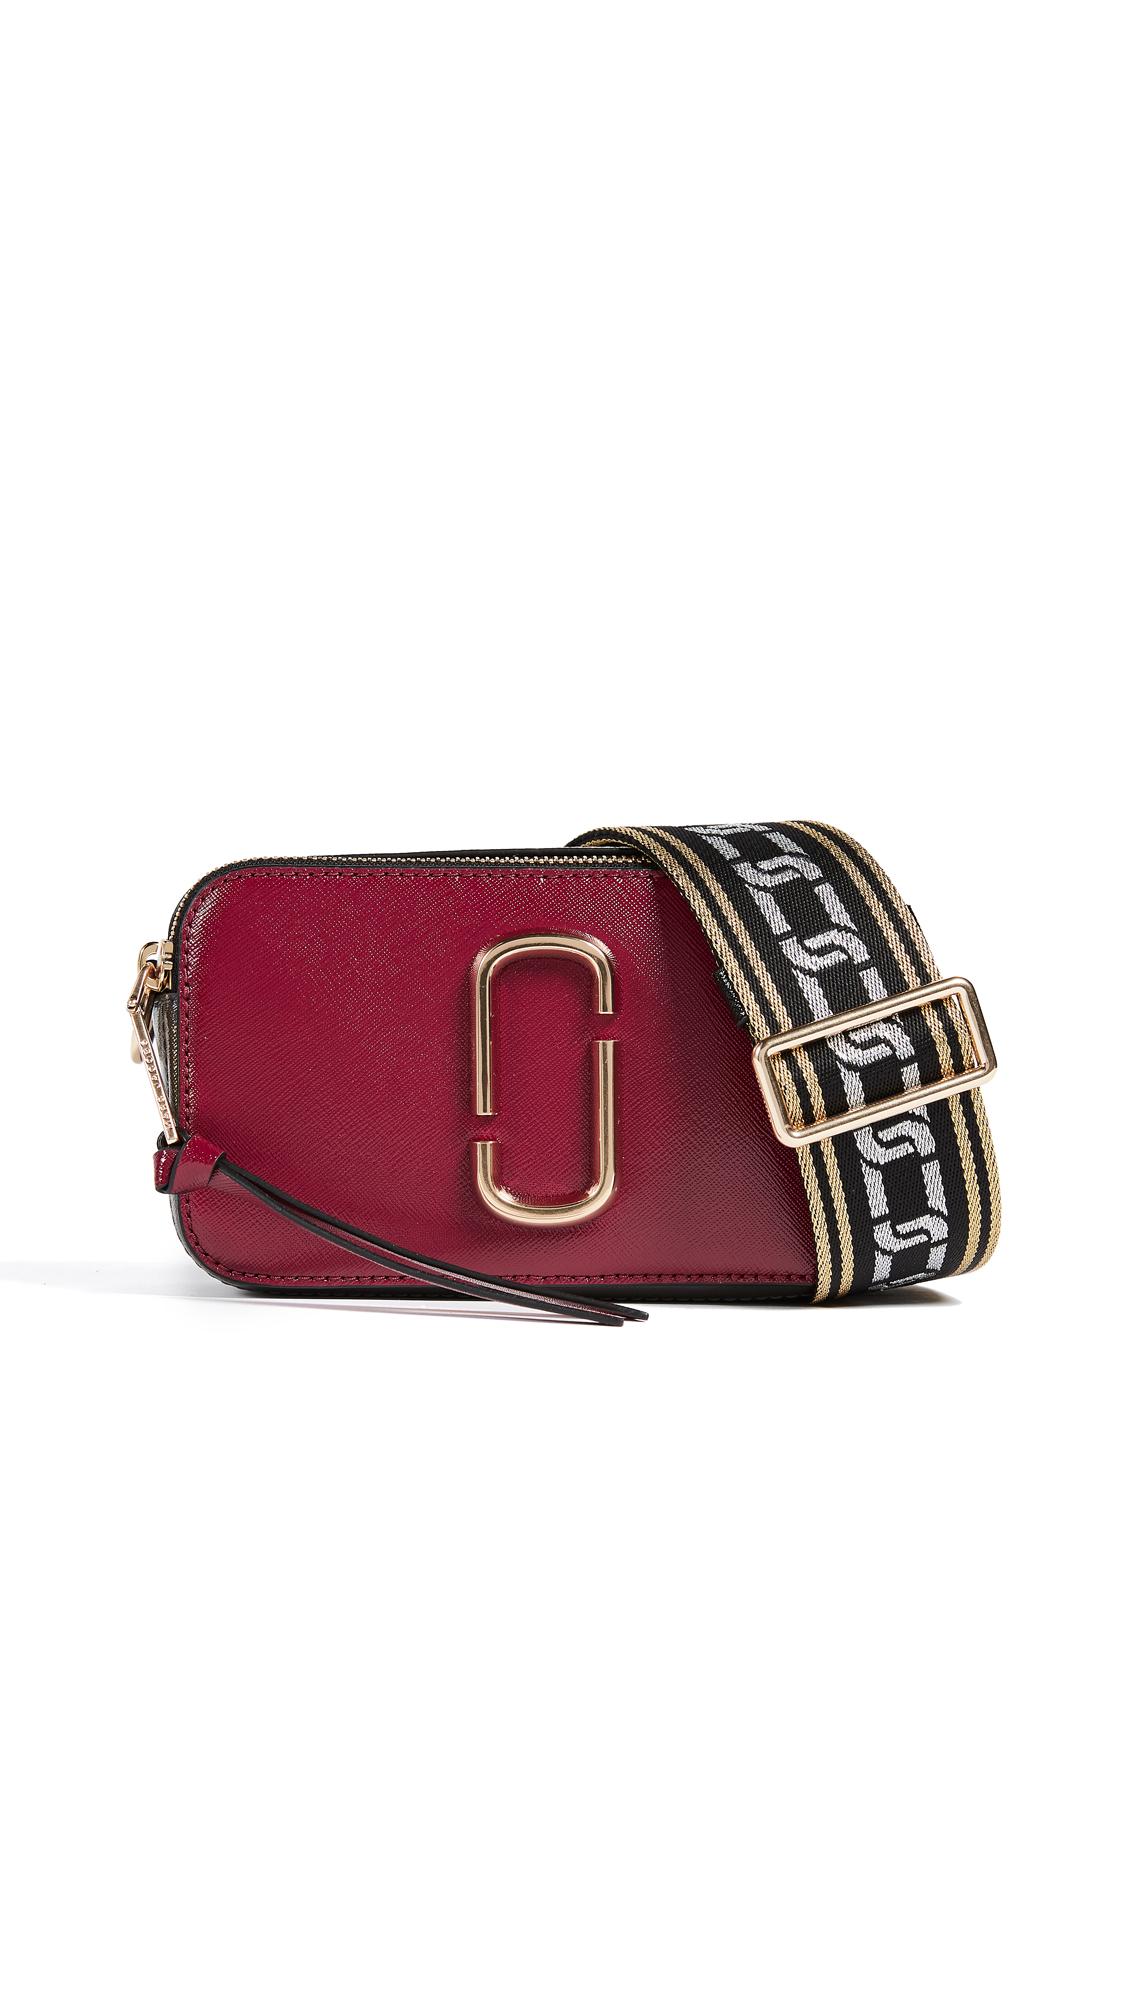 Marc Jacobs Snapshot Cross Body Bag - Deep Maroon/Granite